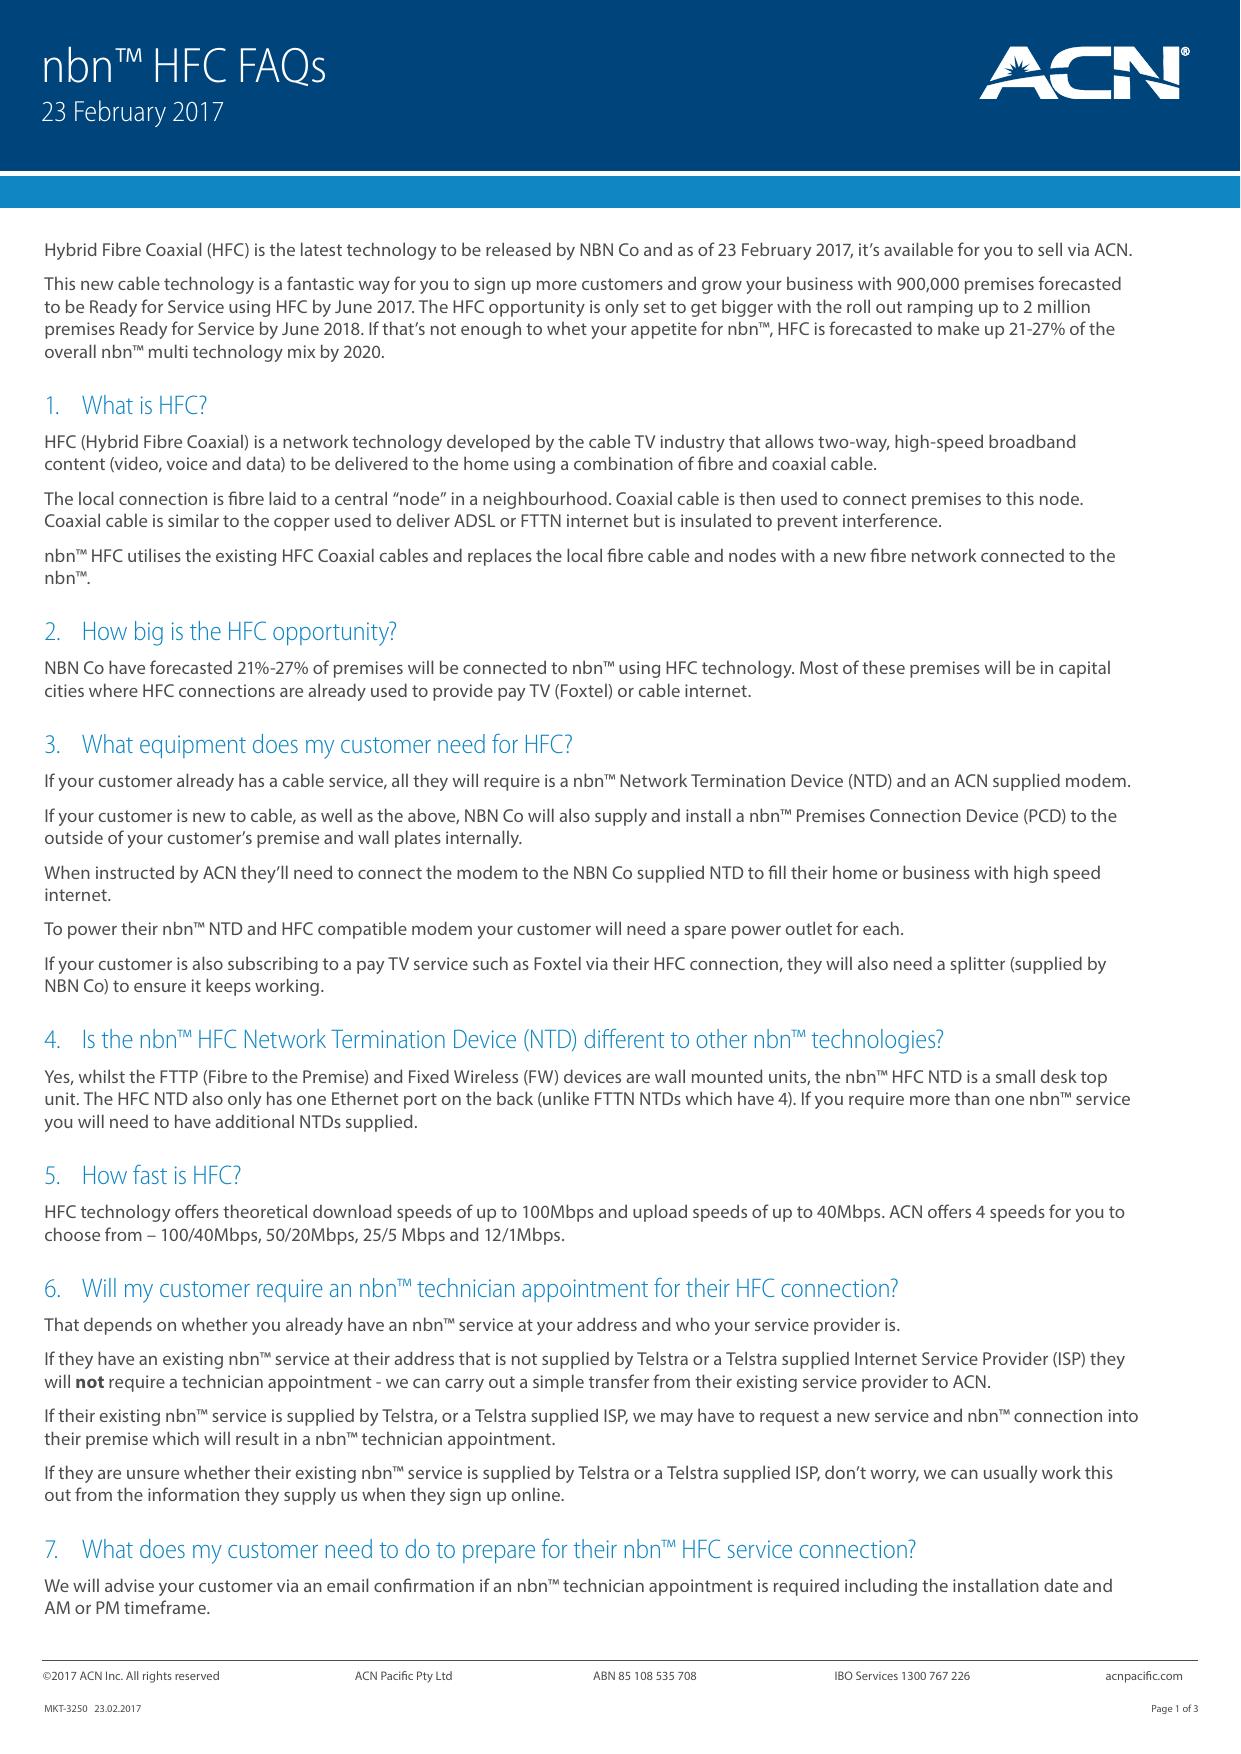 nbn™ HFC FAQs   manualzz com